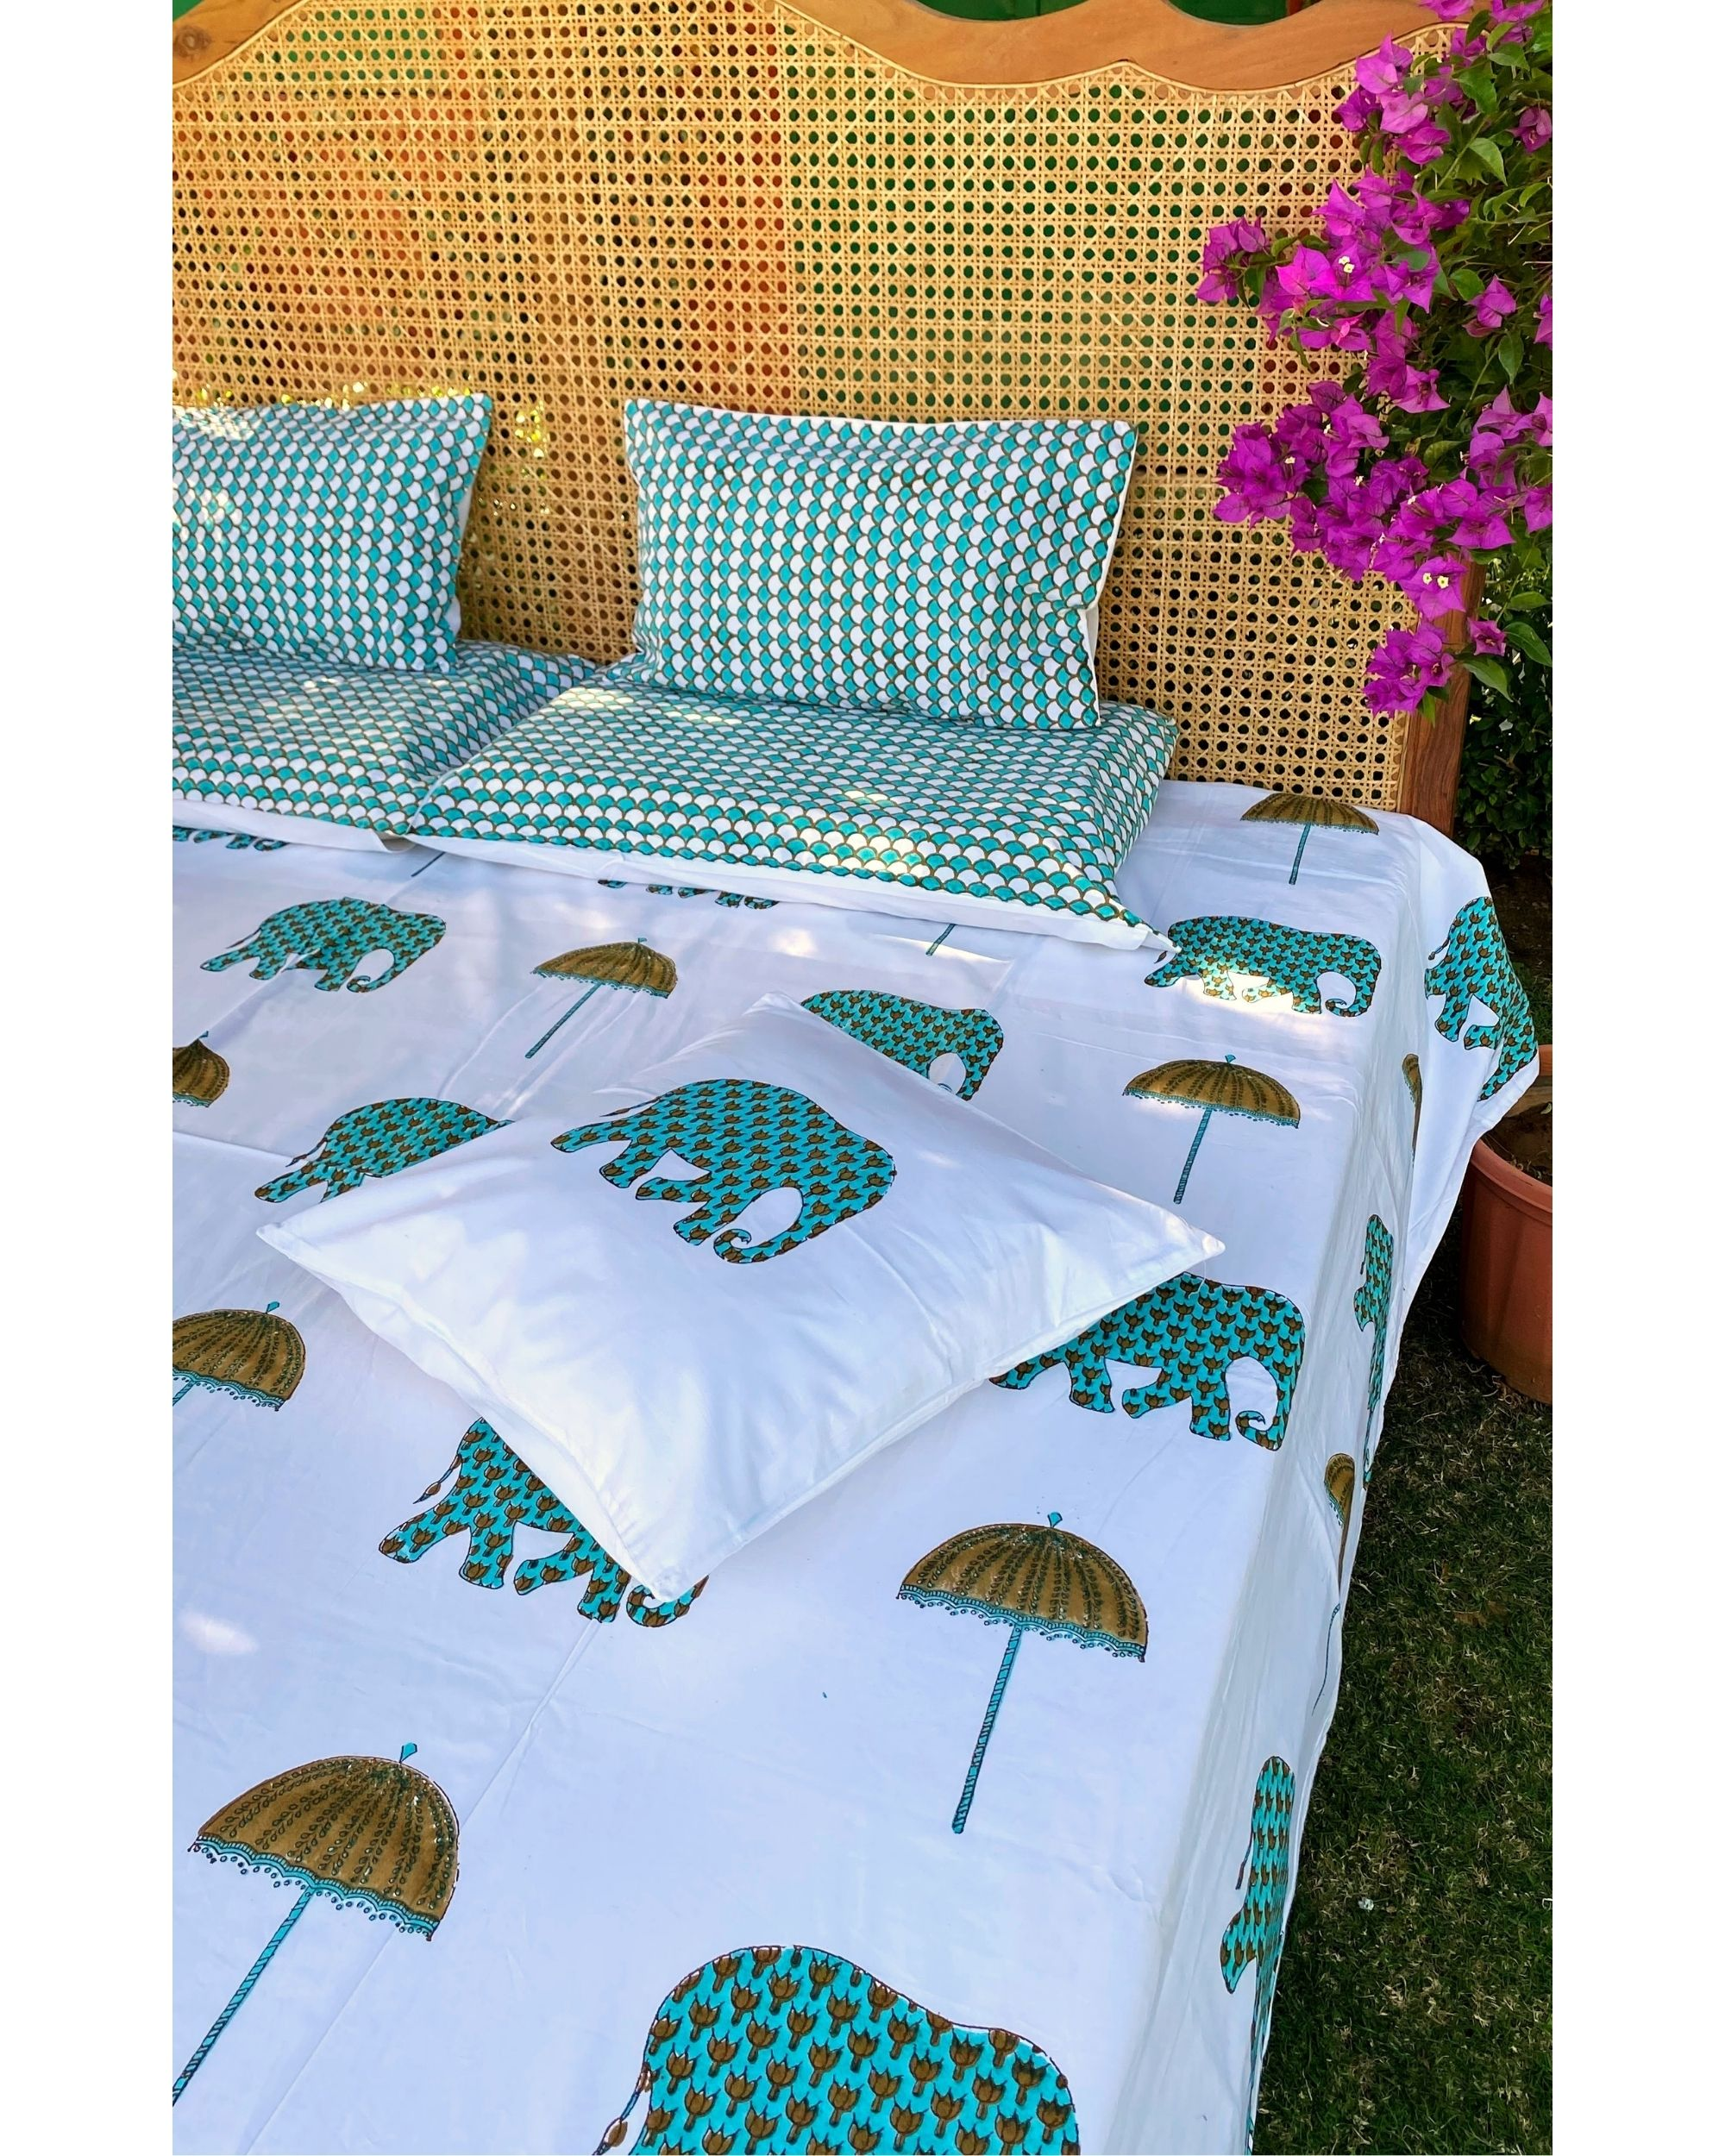 Chhatri & haathi square and lumbar cushion covers - set of 4